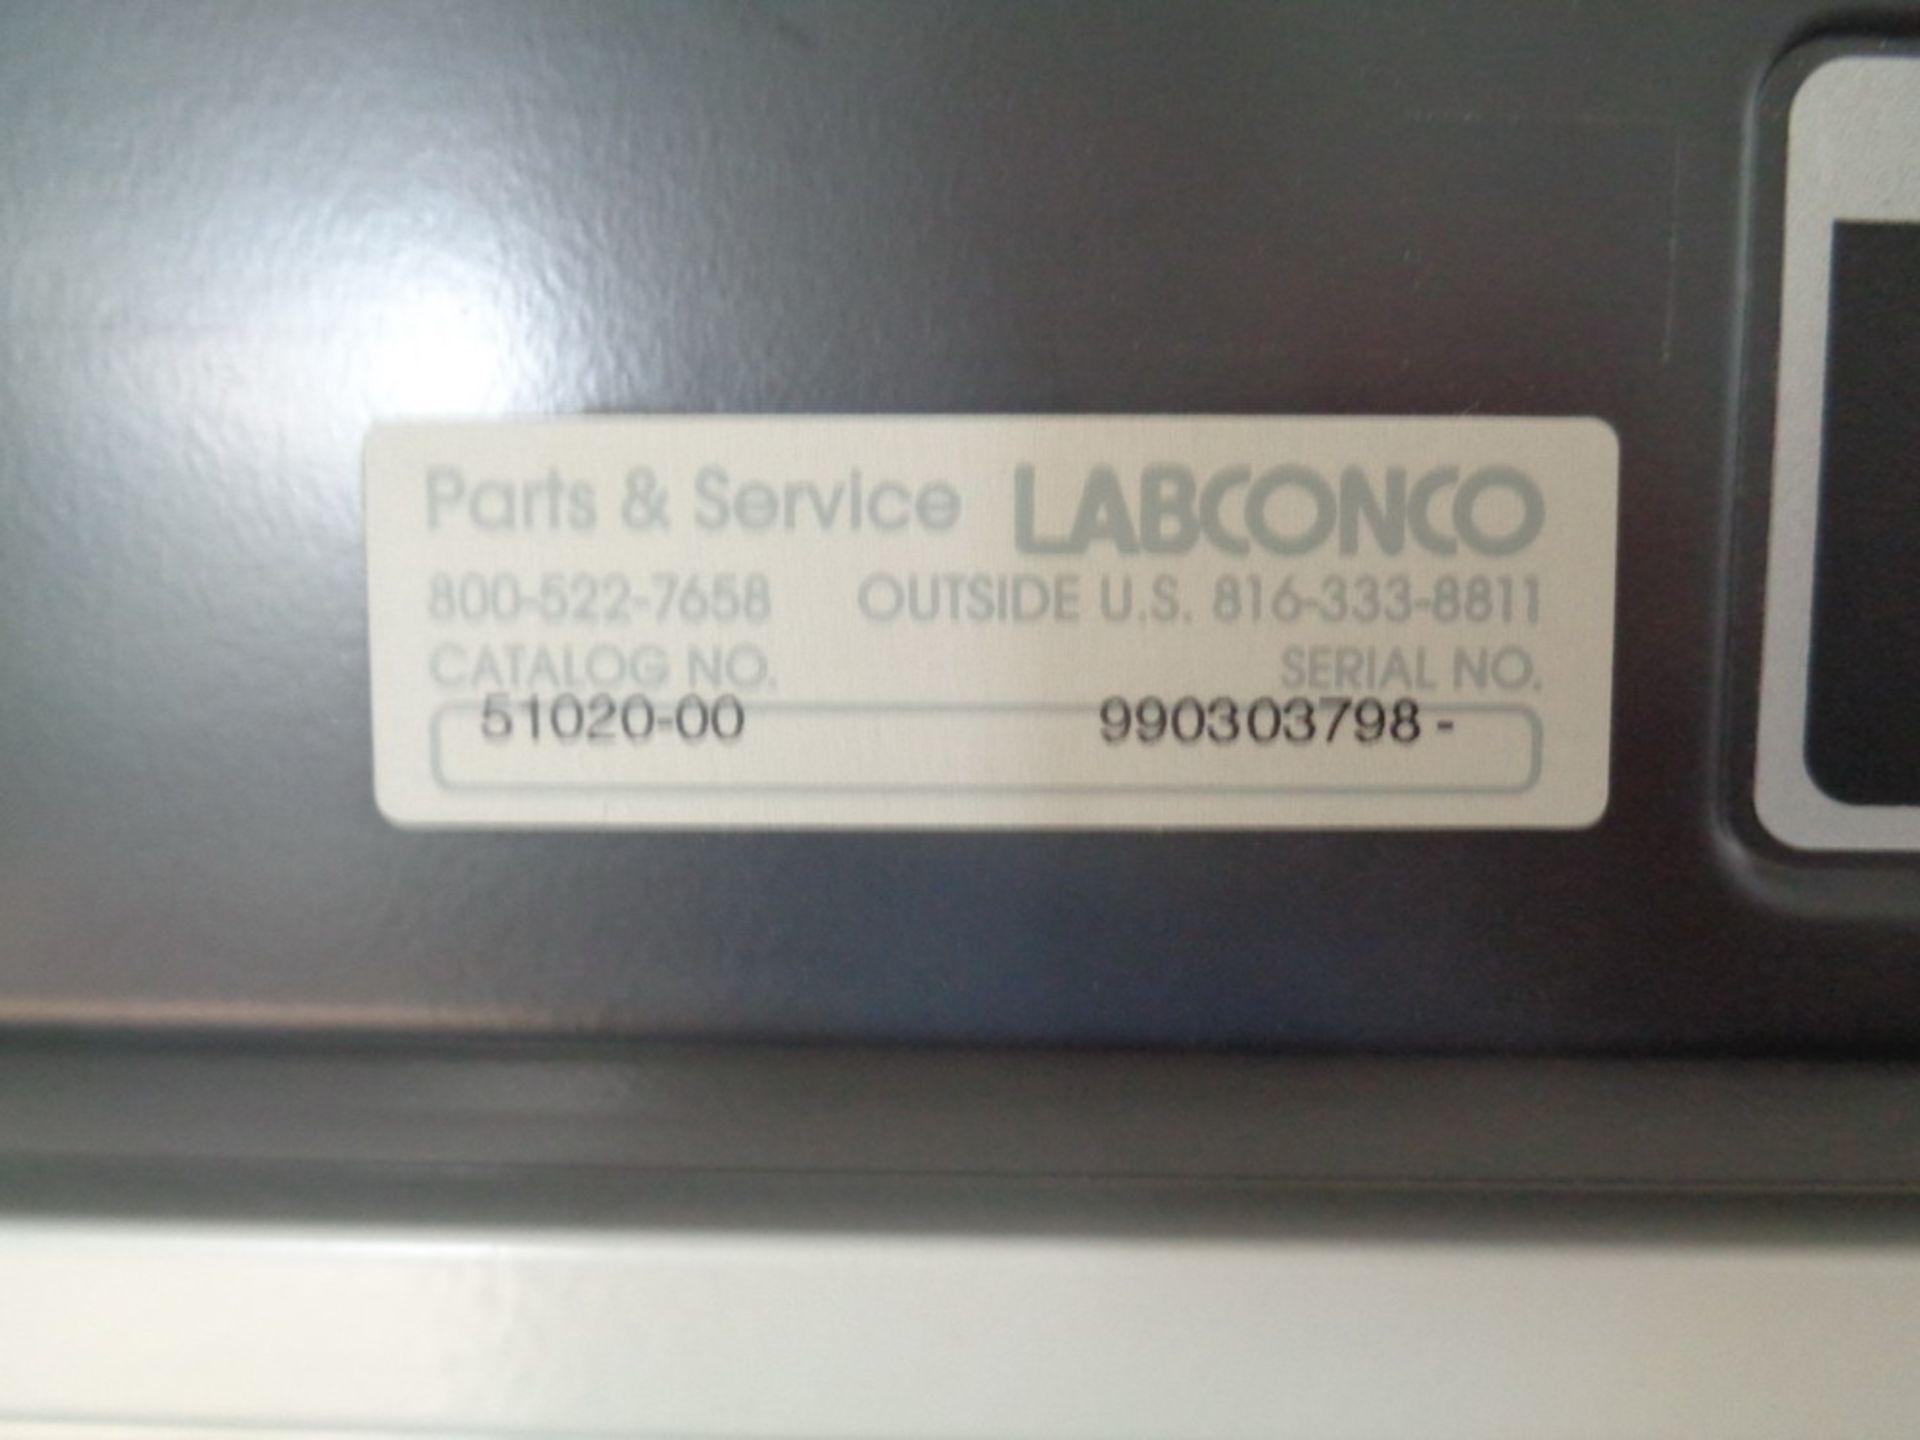 Lot 117 - Labconco PCR Enclosure, Cat# 51020-00, S/N 990303798